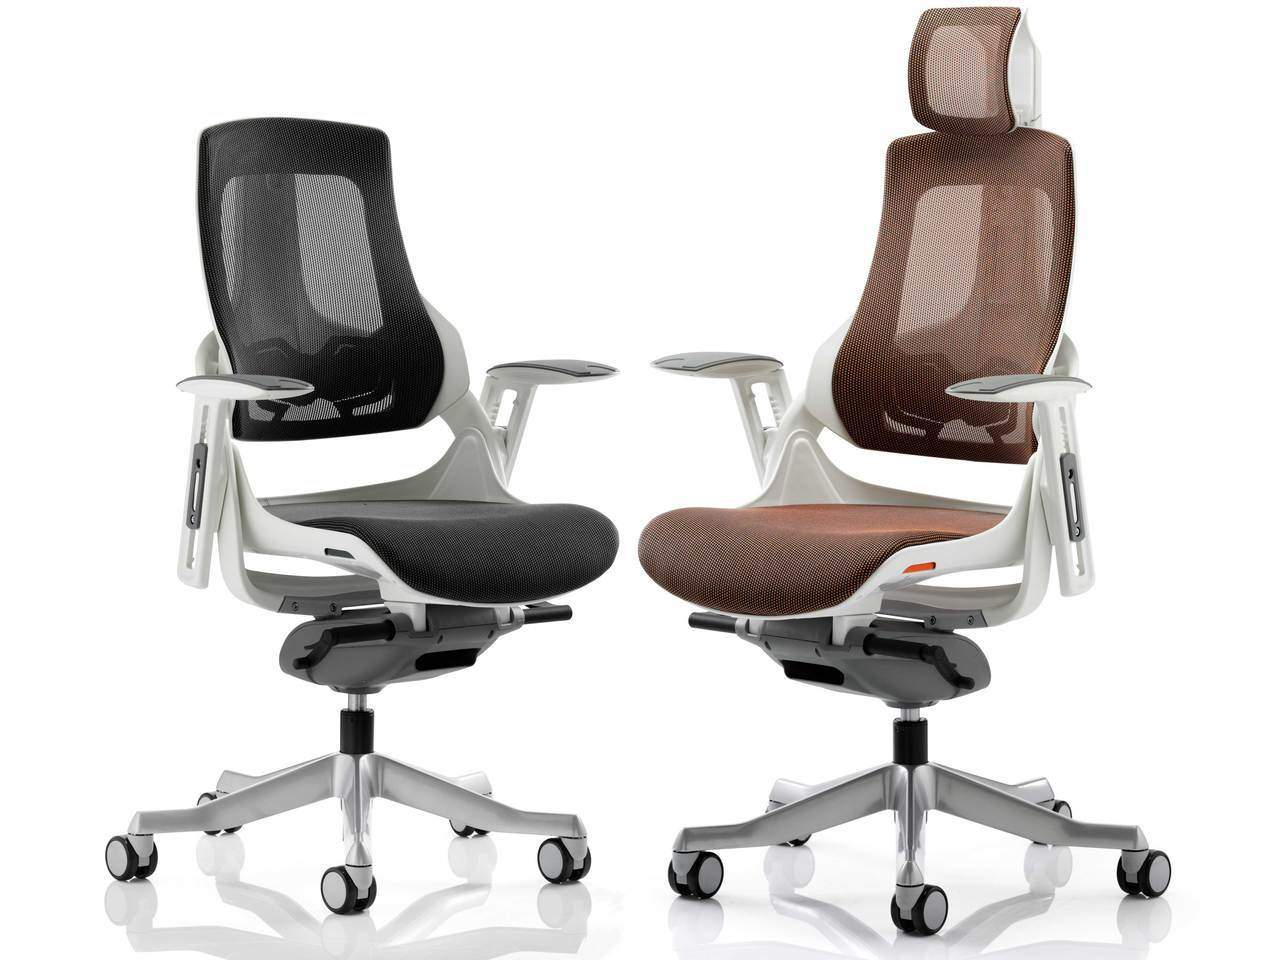 Zephyr Mesh Executive Office Chair in Mandarin or Black